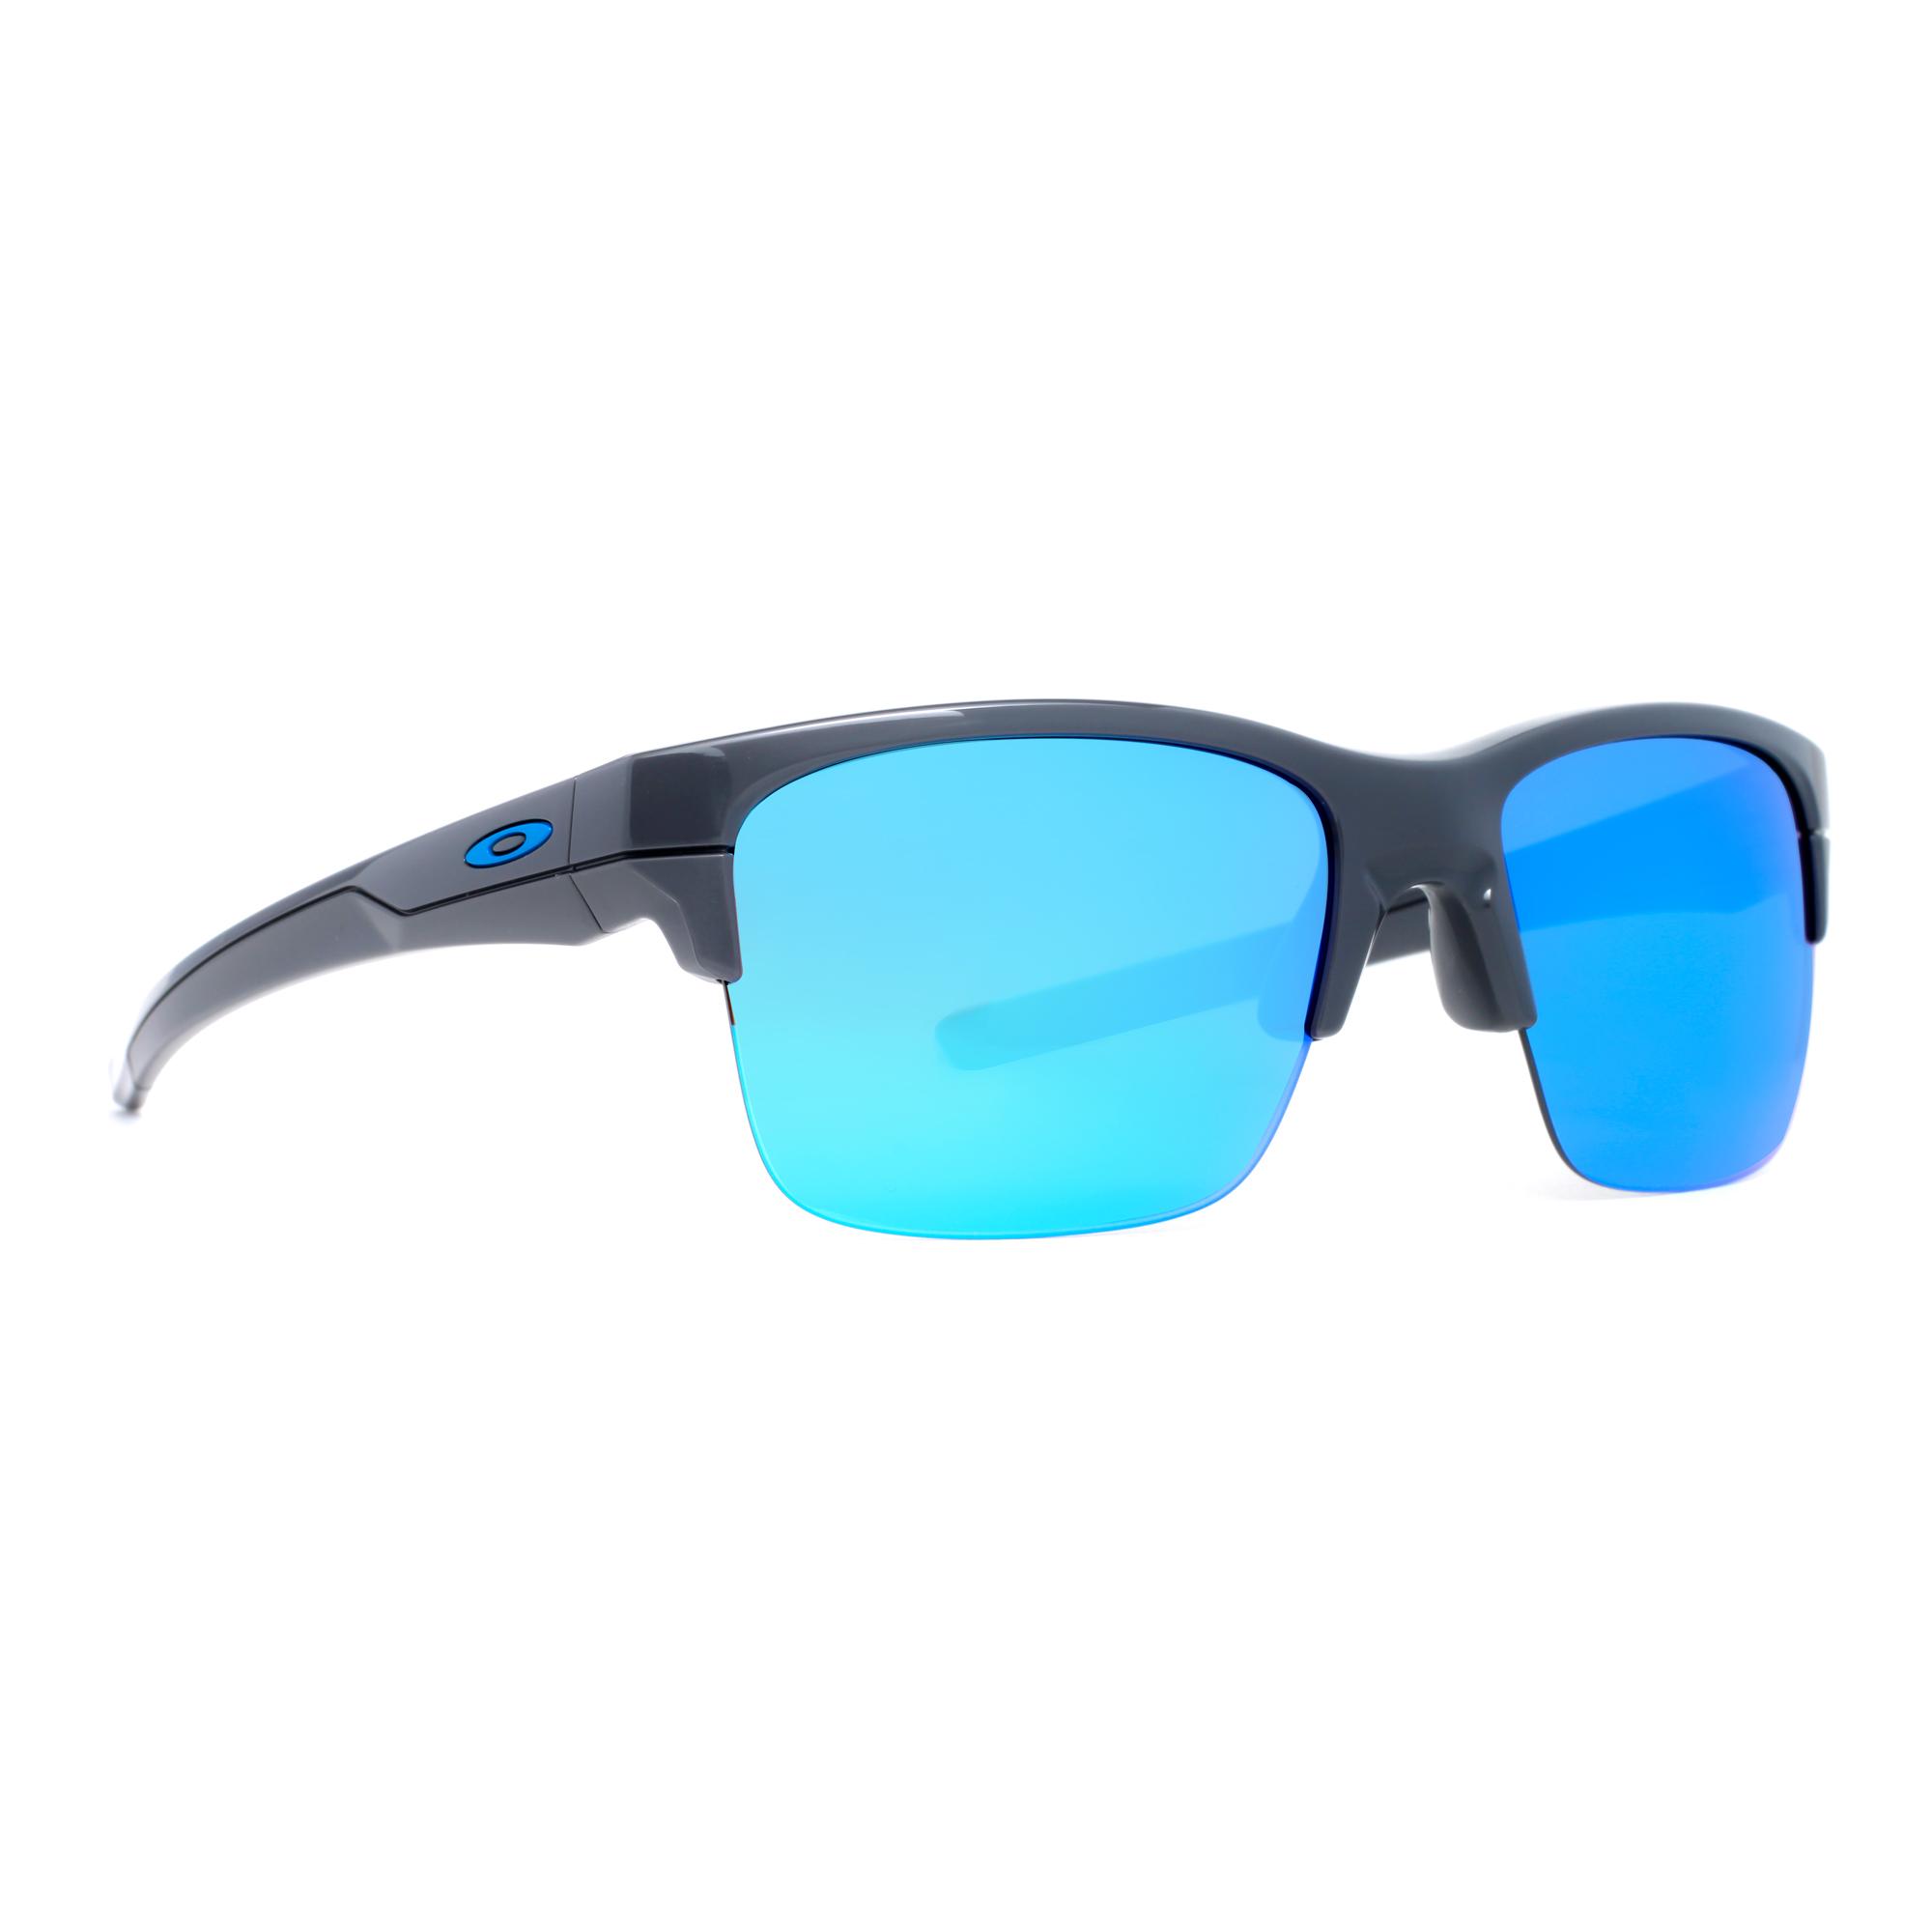 949f2675a967d ... frame blue lens sunglasses freeshipping 498cc db787  low price baby  blue oakley sunglasses uk 0449f d5379